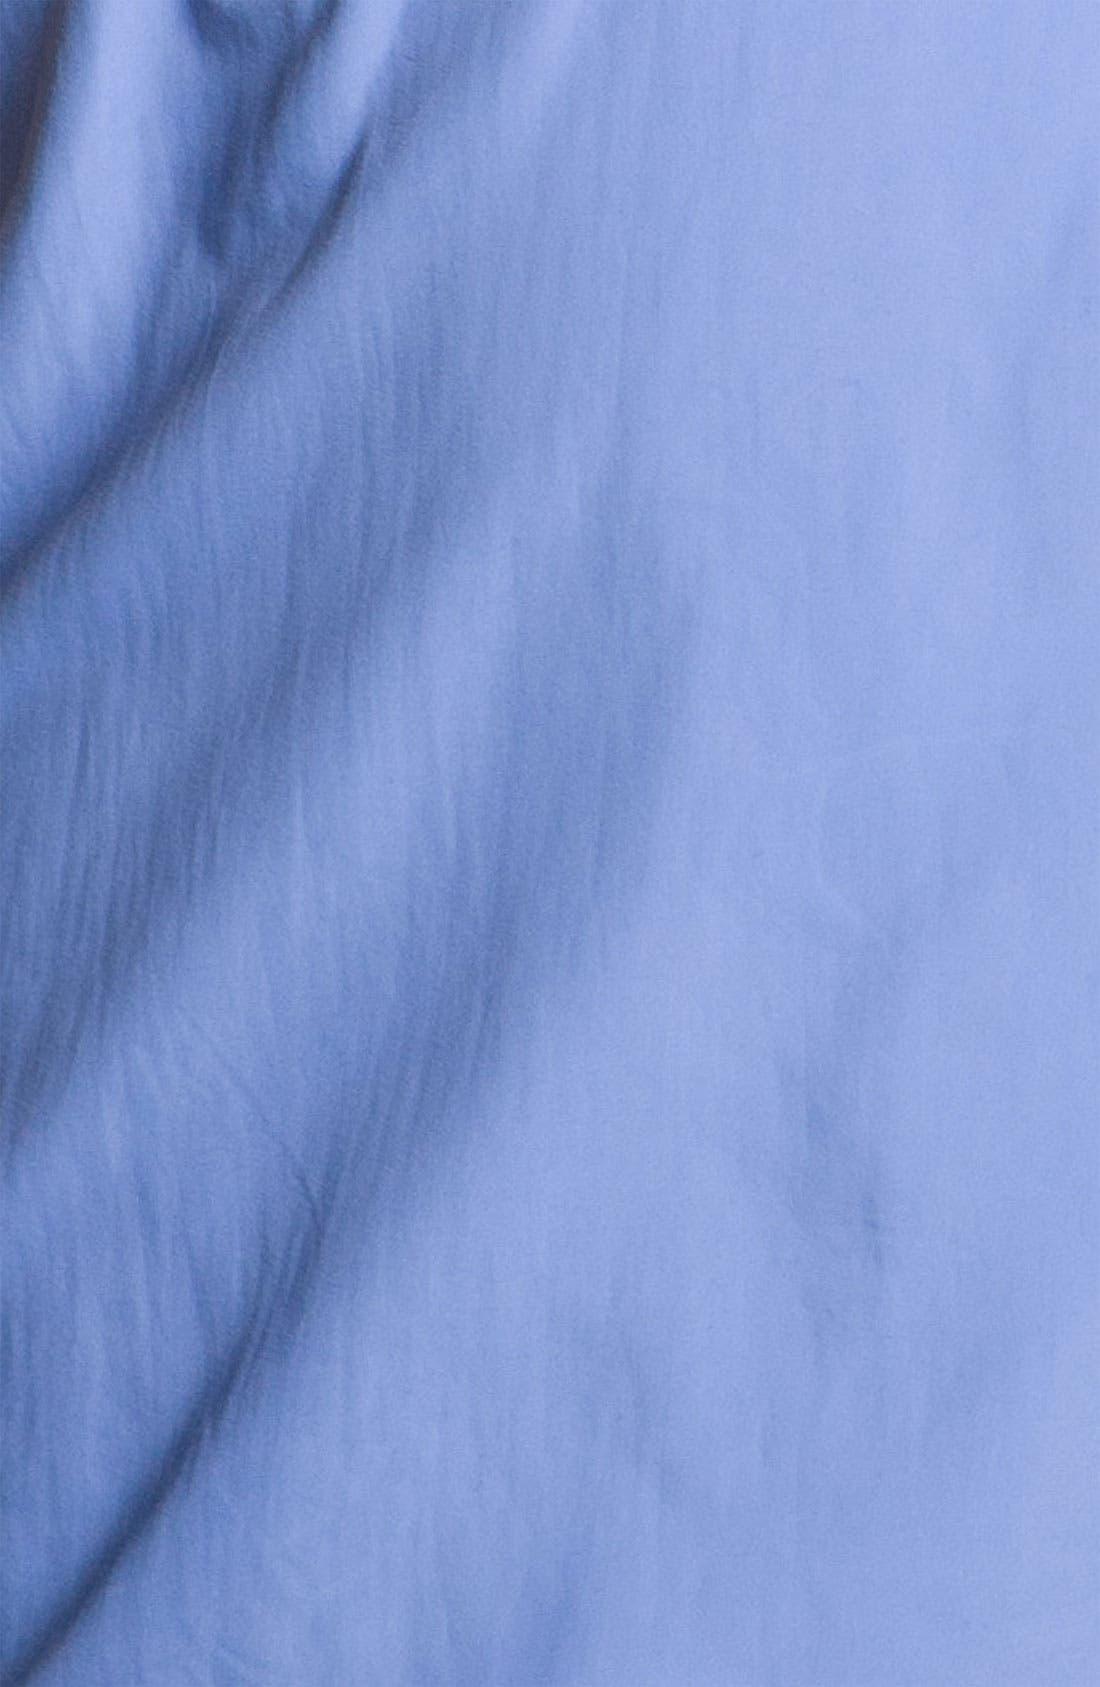 Alternate Image 4  - Vilebrequin 'Moorea' Water-Activated Jellyfish Print Swim Trunks